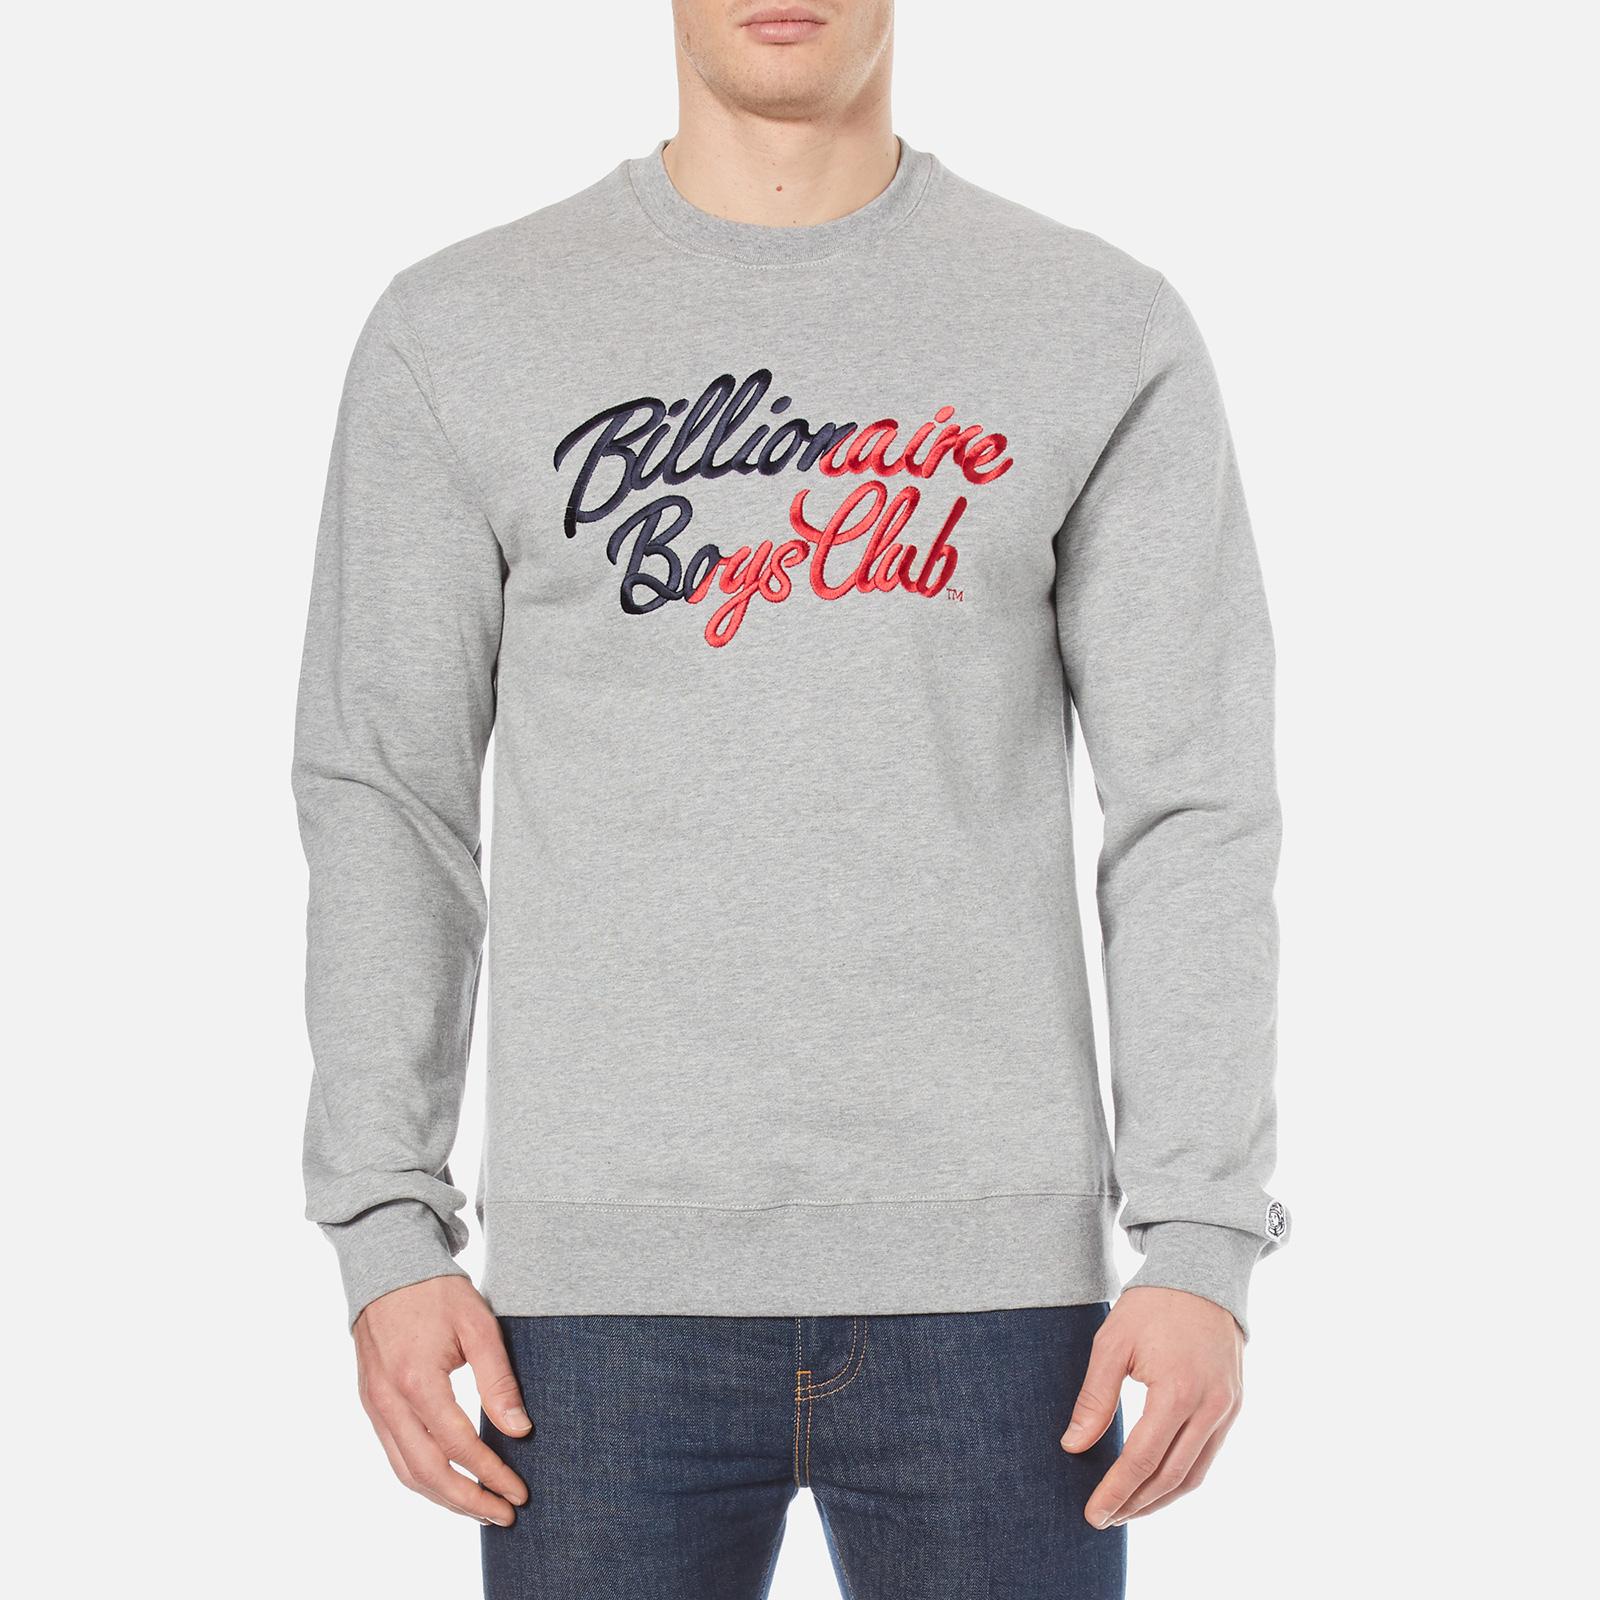 4c34994bc Billionaire Boys Club Men's Script Embroidered Sweatshirt - Heather Mens  Clothing | TheHut.com